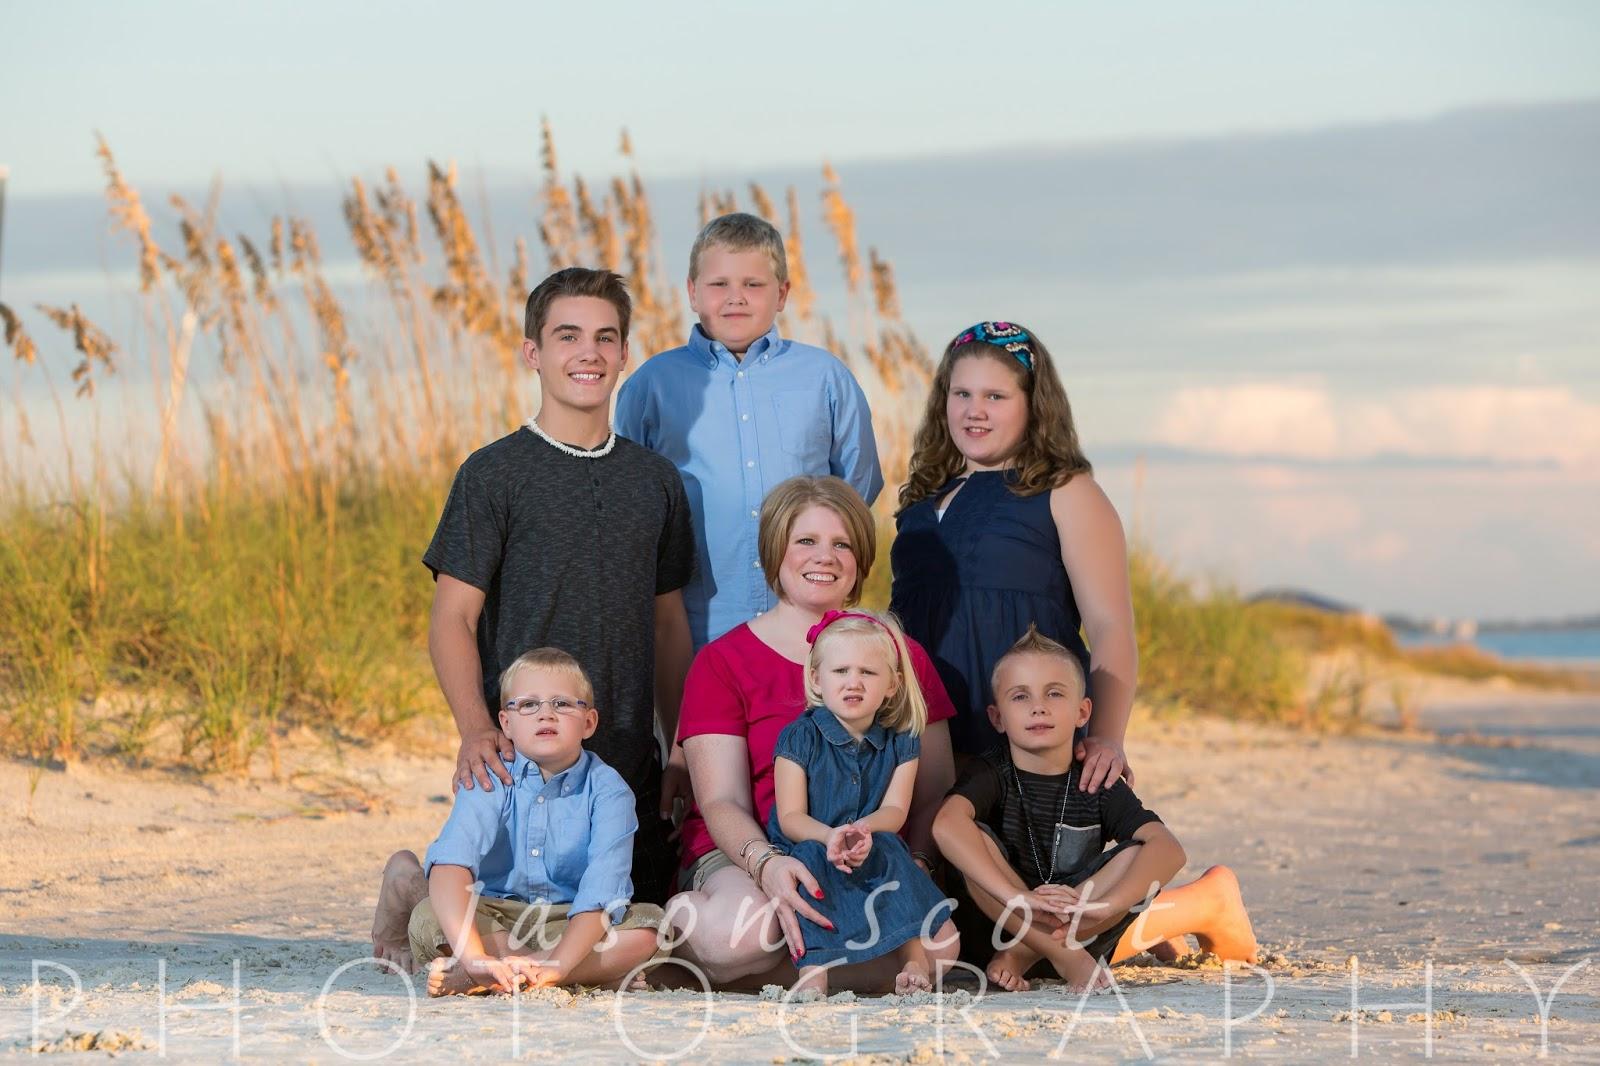 siesta key beach portraits holley family jason scott photography holley family on siesta key 2015